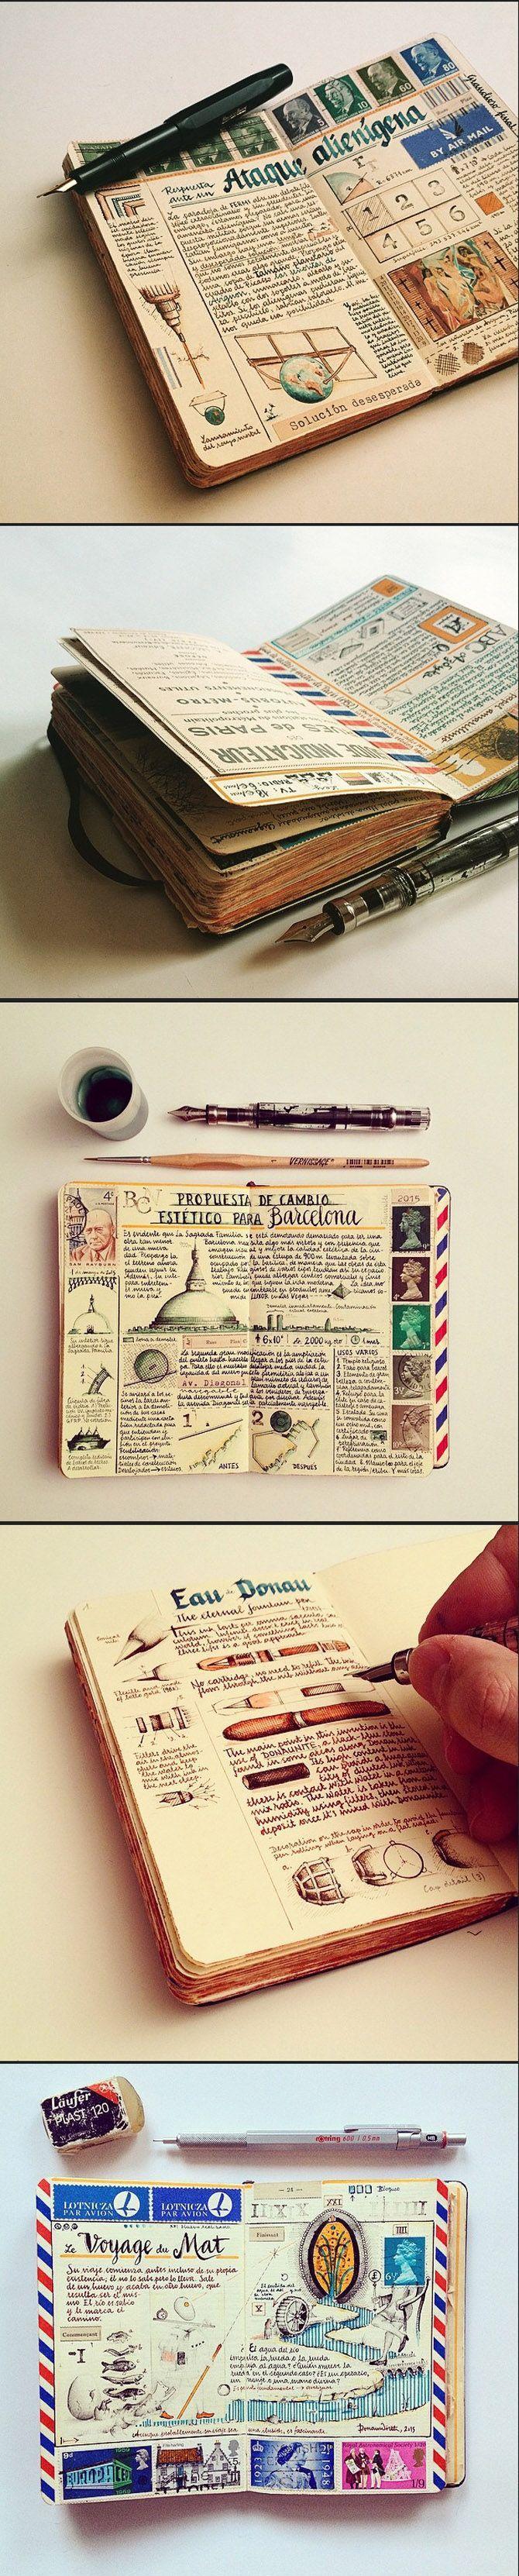 .José Naranja #journal #sketch | www.flickr.com/...: